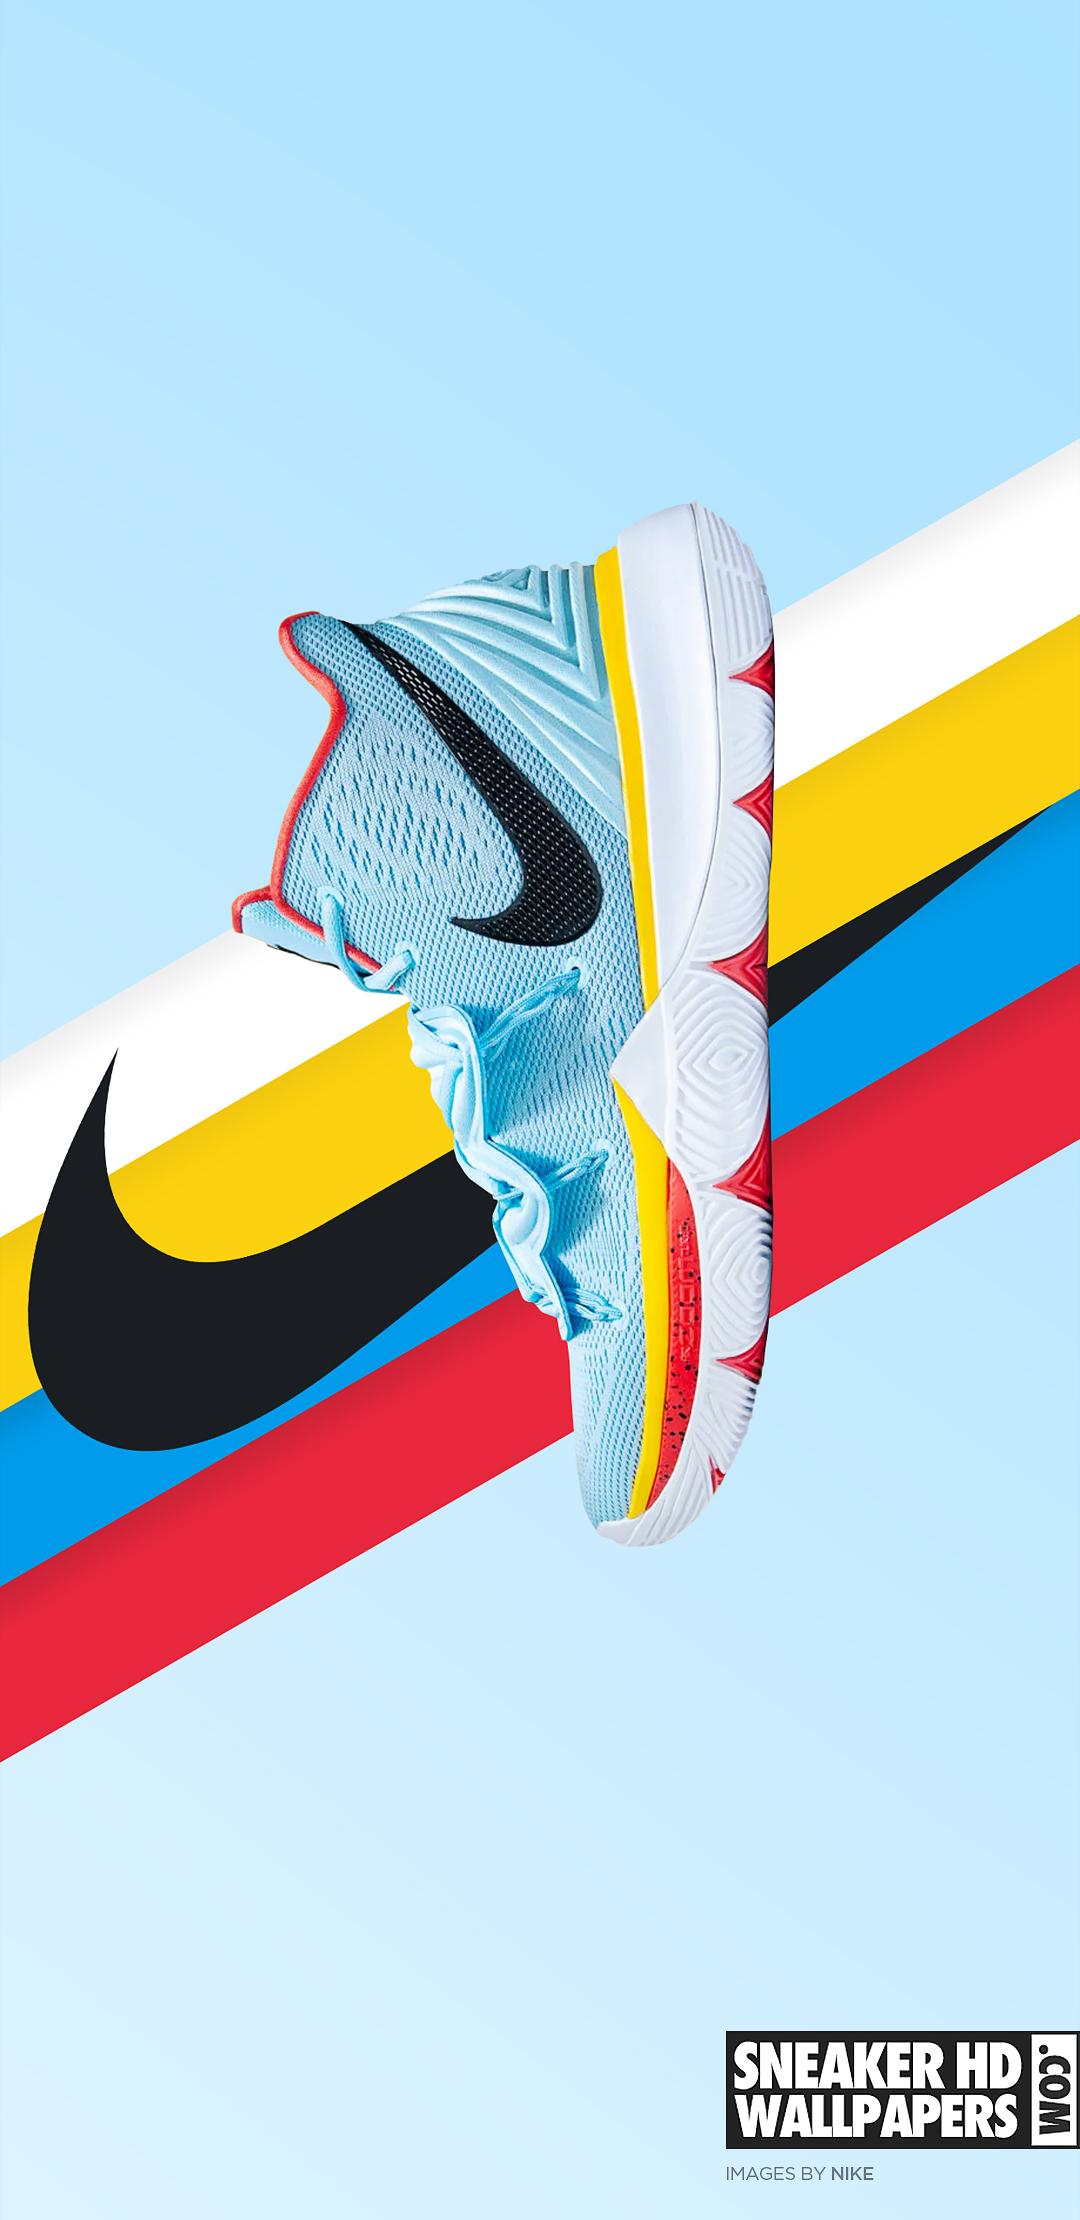 Sneakerhdwallpapers Com Your Favorite Sneakers In 4k Retina Mobile And Hd Wallpaper Resolutions Kyrie Irving Archives Sneakerhdwallpapers Com Your Favorite Sneakers In 4k Retina Mobile And Hd Wallpaper Resolutions